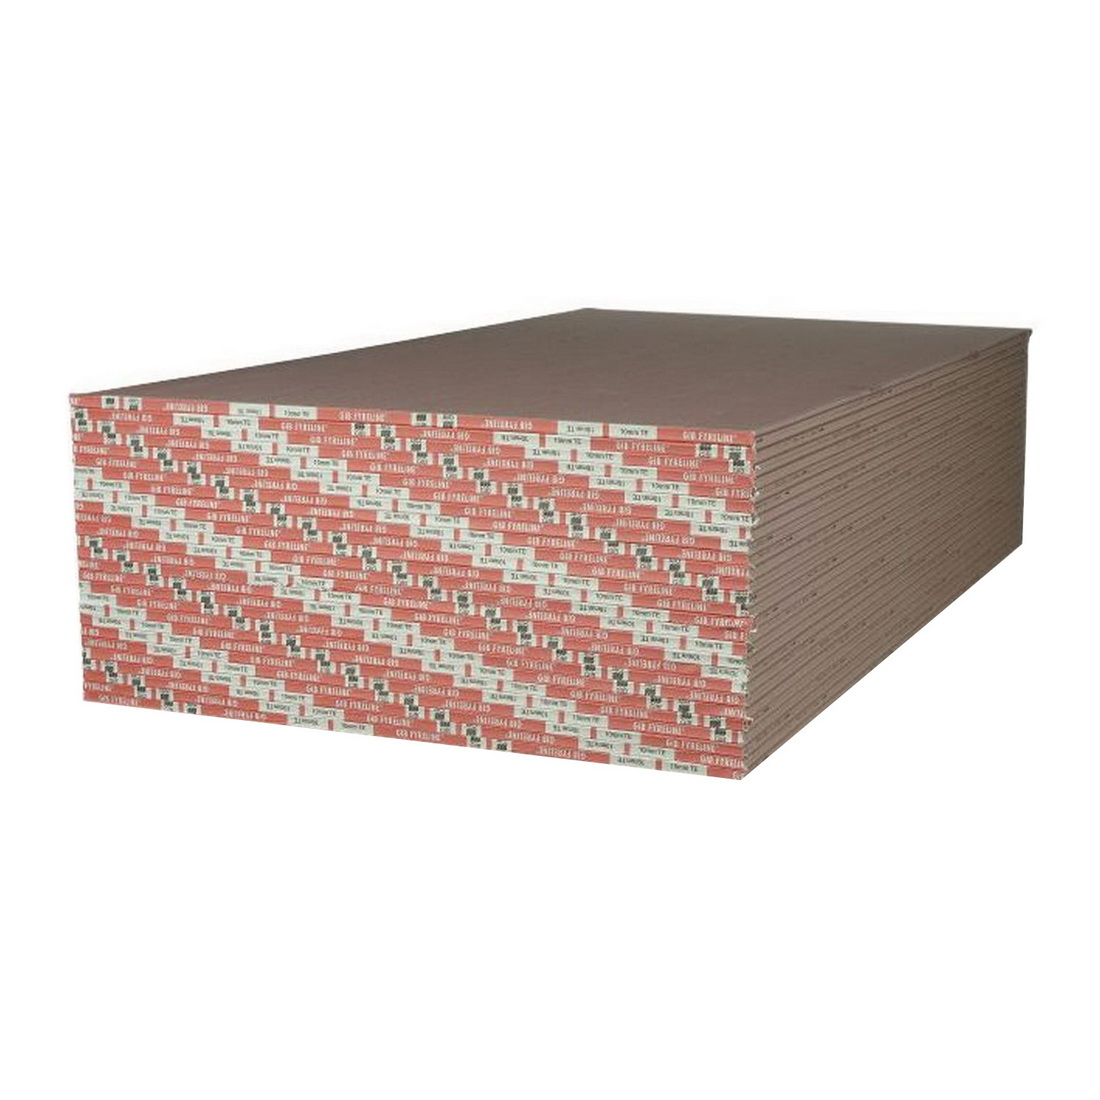 Fyreline Plasterboard 2700 x 1200 x 13mm 11682